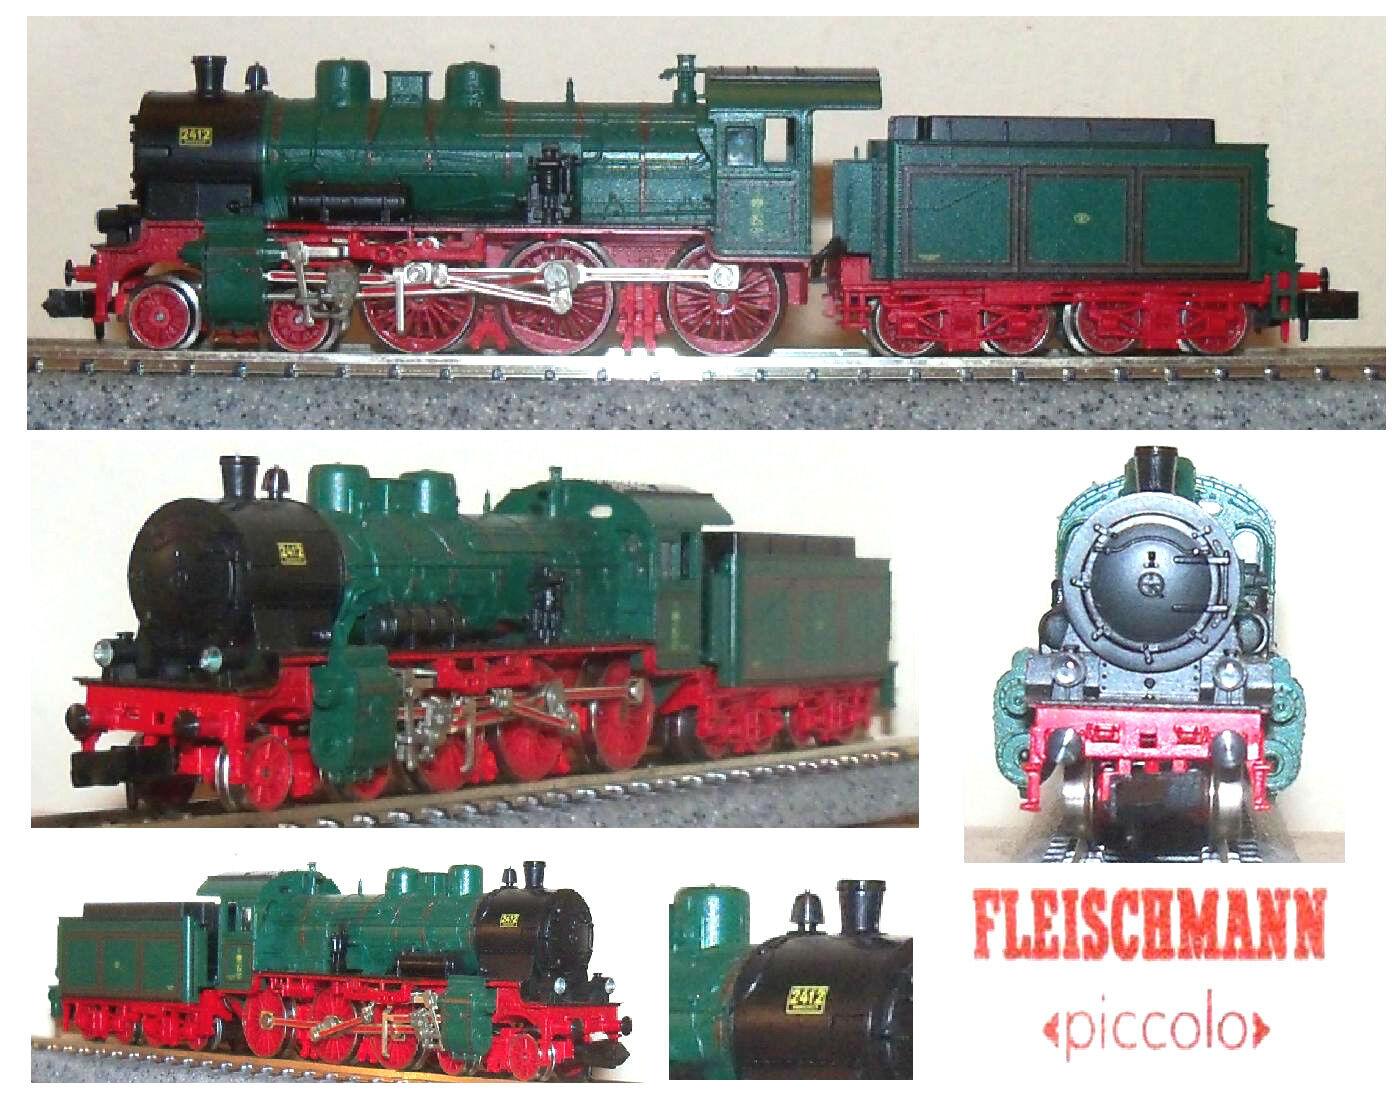 FLEISCHMANN FLEISCHMANN FLEISCHMANN 6586 RETRO LOCOMOTIVA A VAPORE LIMITED-EDITION Sr.BR38 4-6-0 SCALA-N cbe510